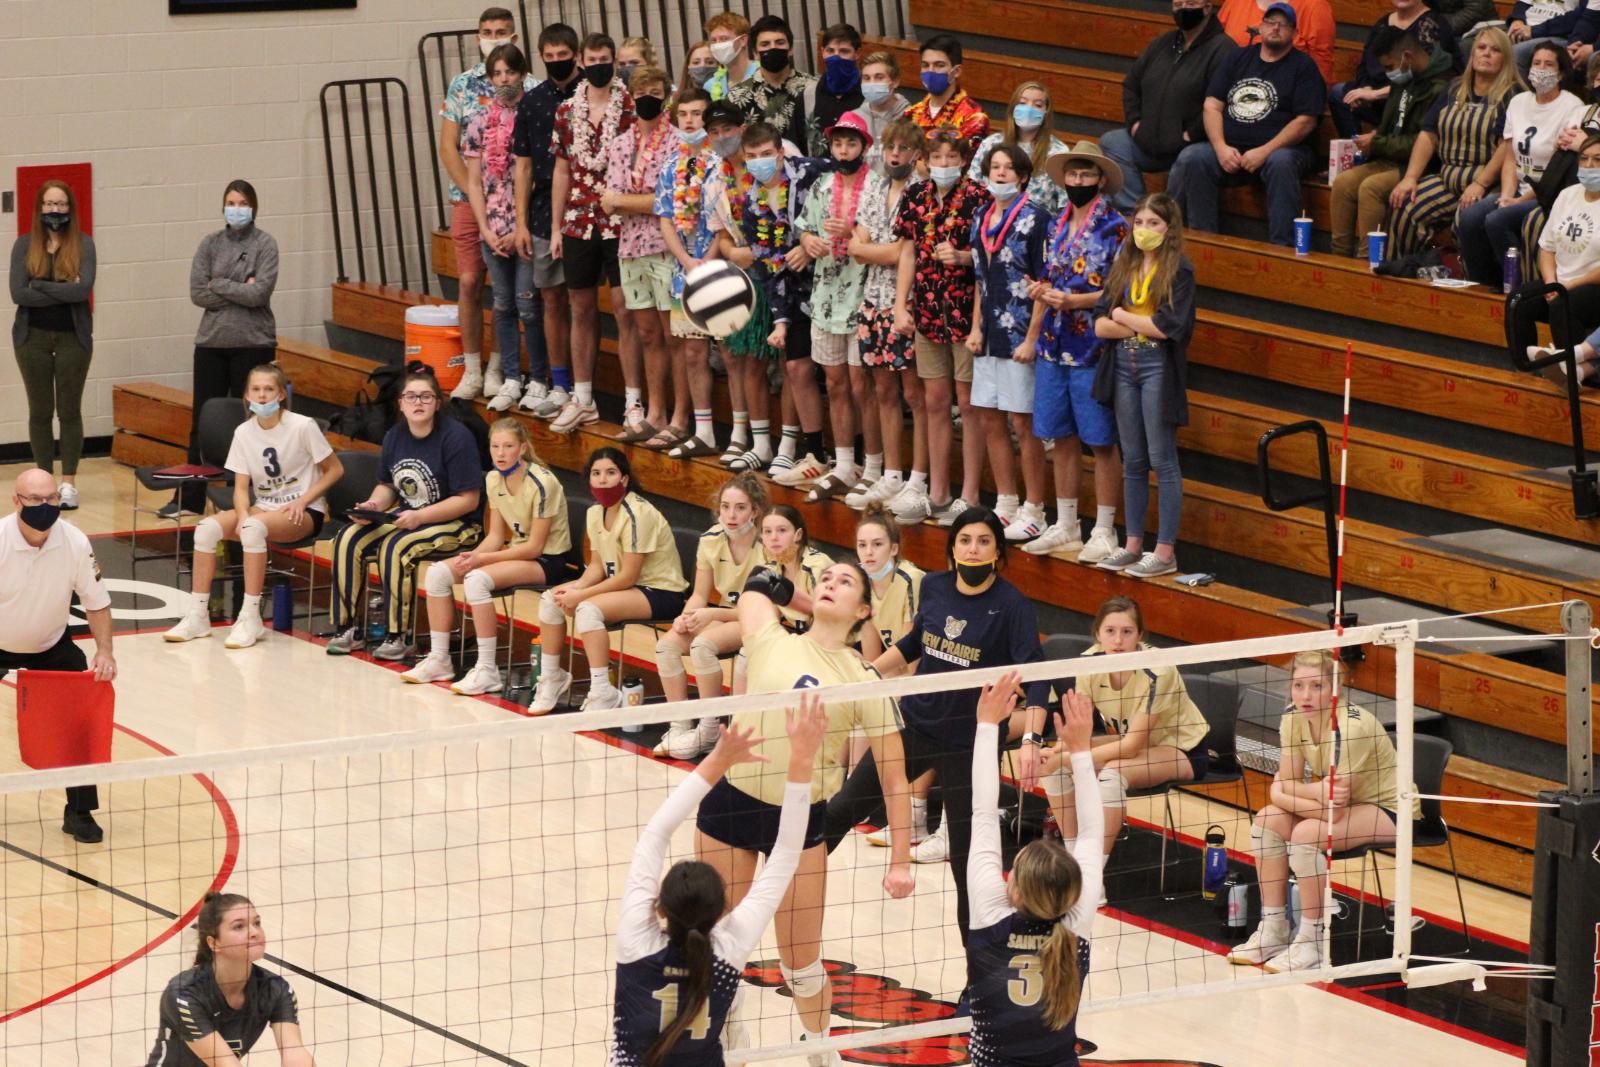 Varsity Volleyball @ IHSAA Semi-State vs. FW Bishop Dwenger  10/31/20  (Photo Gallery)